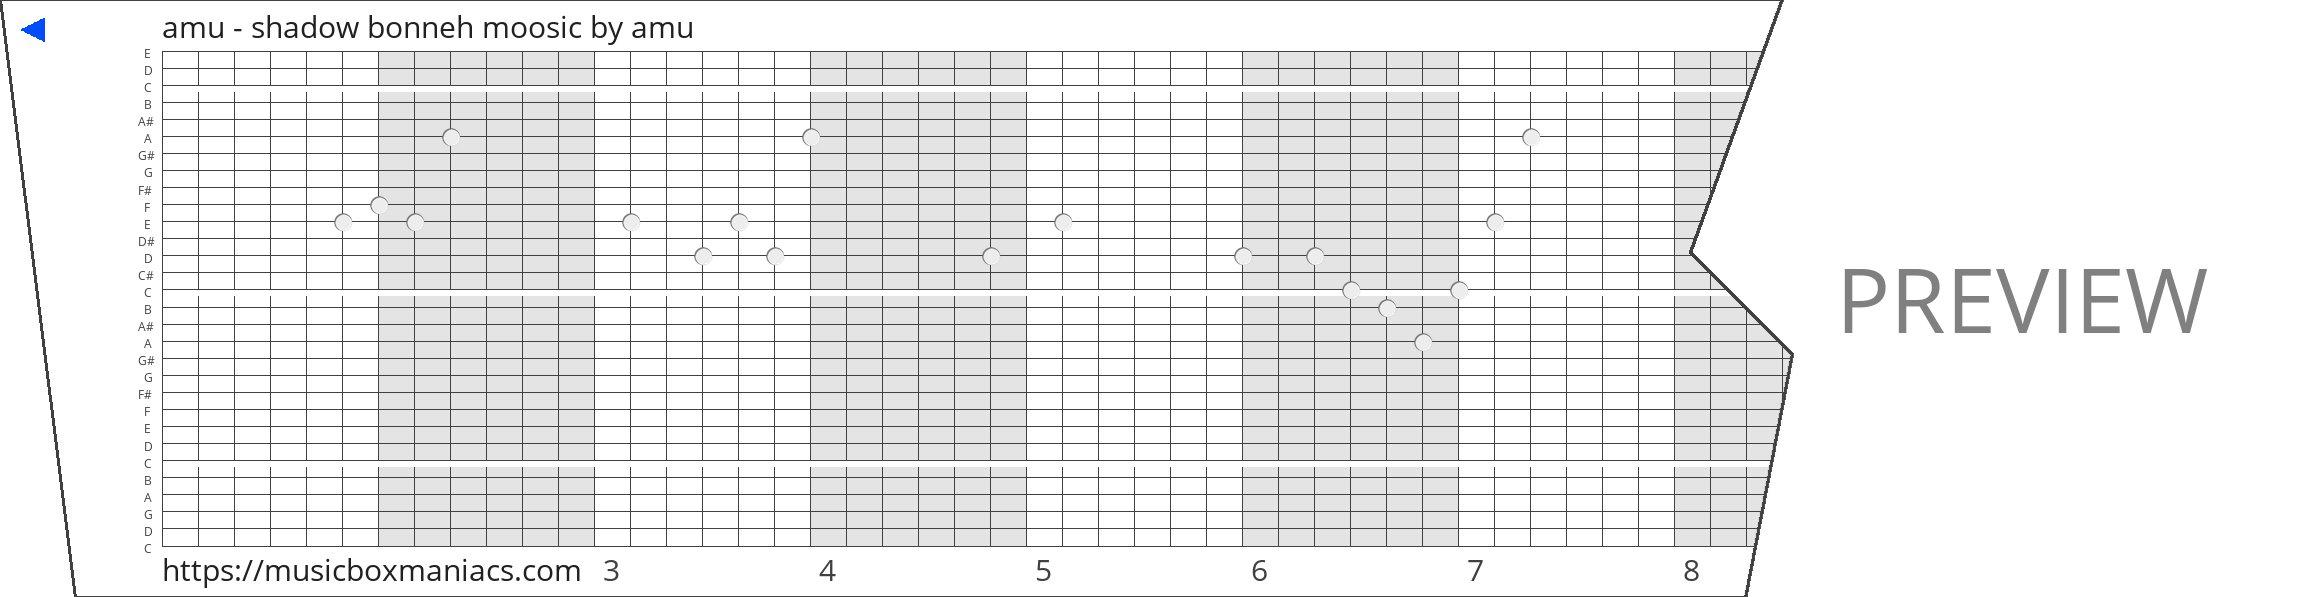 amu - shadow bonneh moosic 30 note music box paper strip